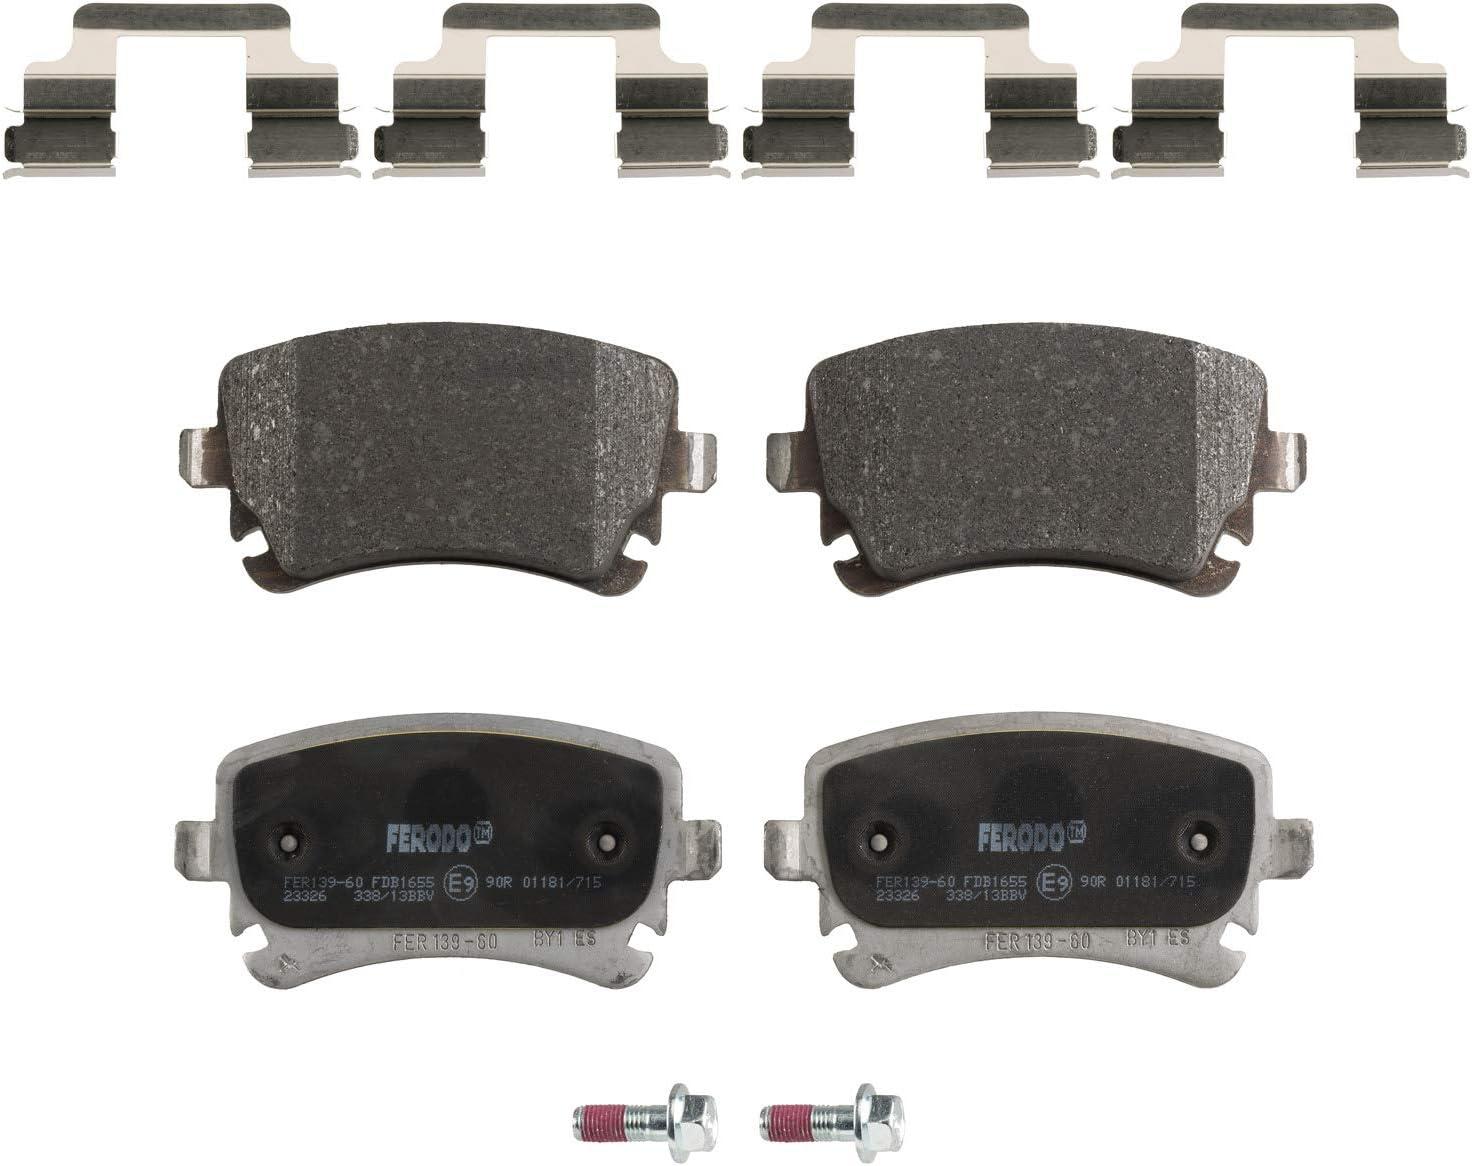 Scheibenbremse FERODO FDB1645 Bremsbelagsatz